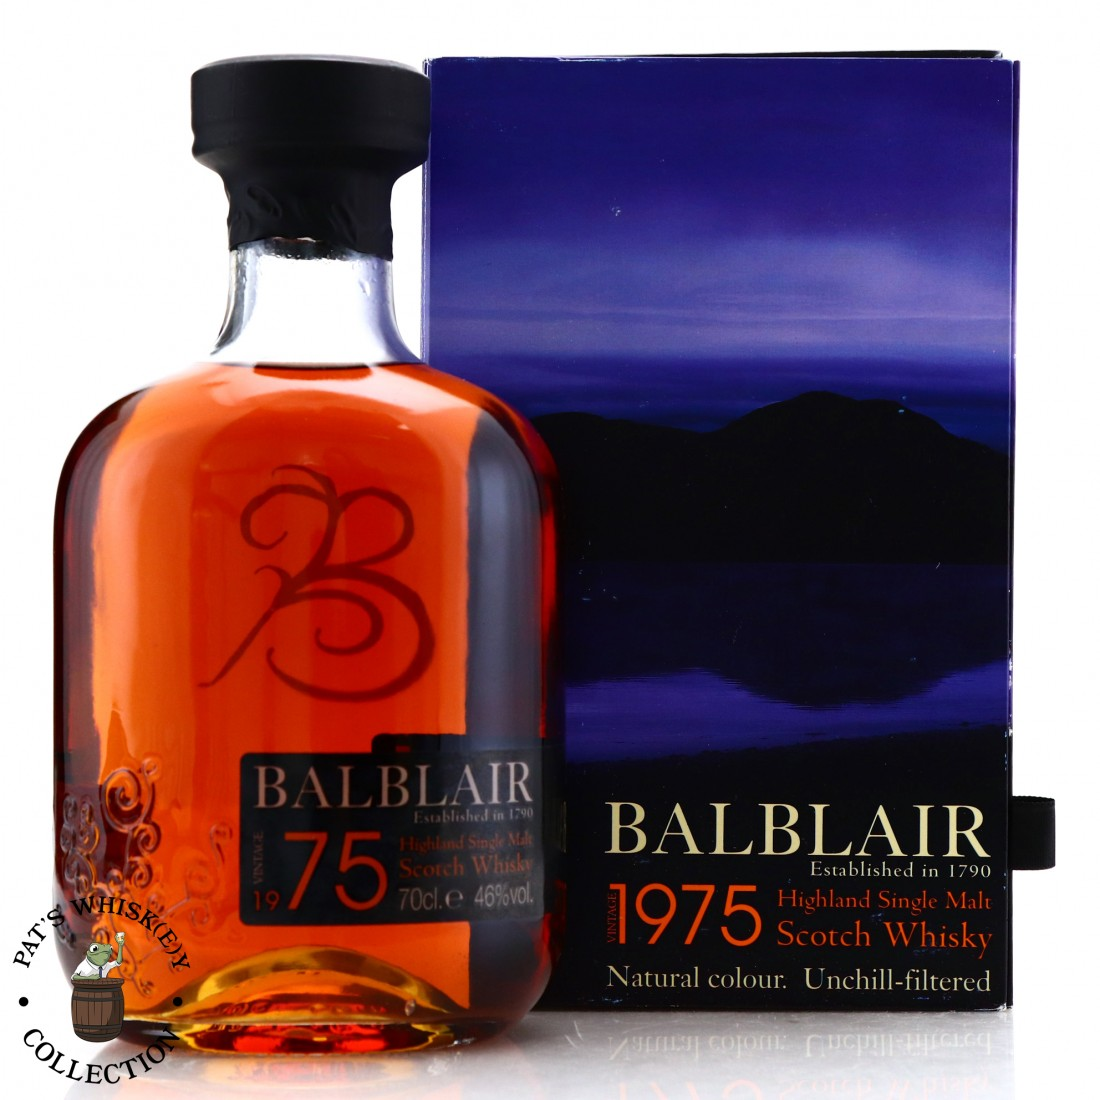 Balblair 1975 1st Release